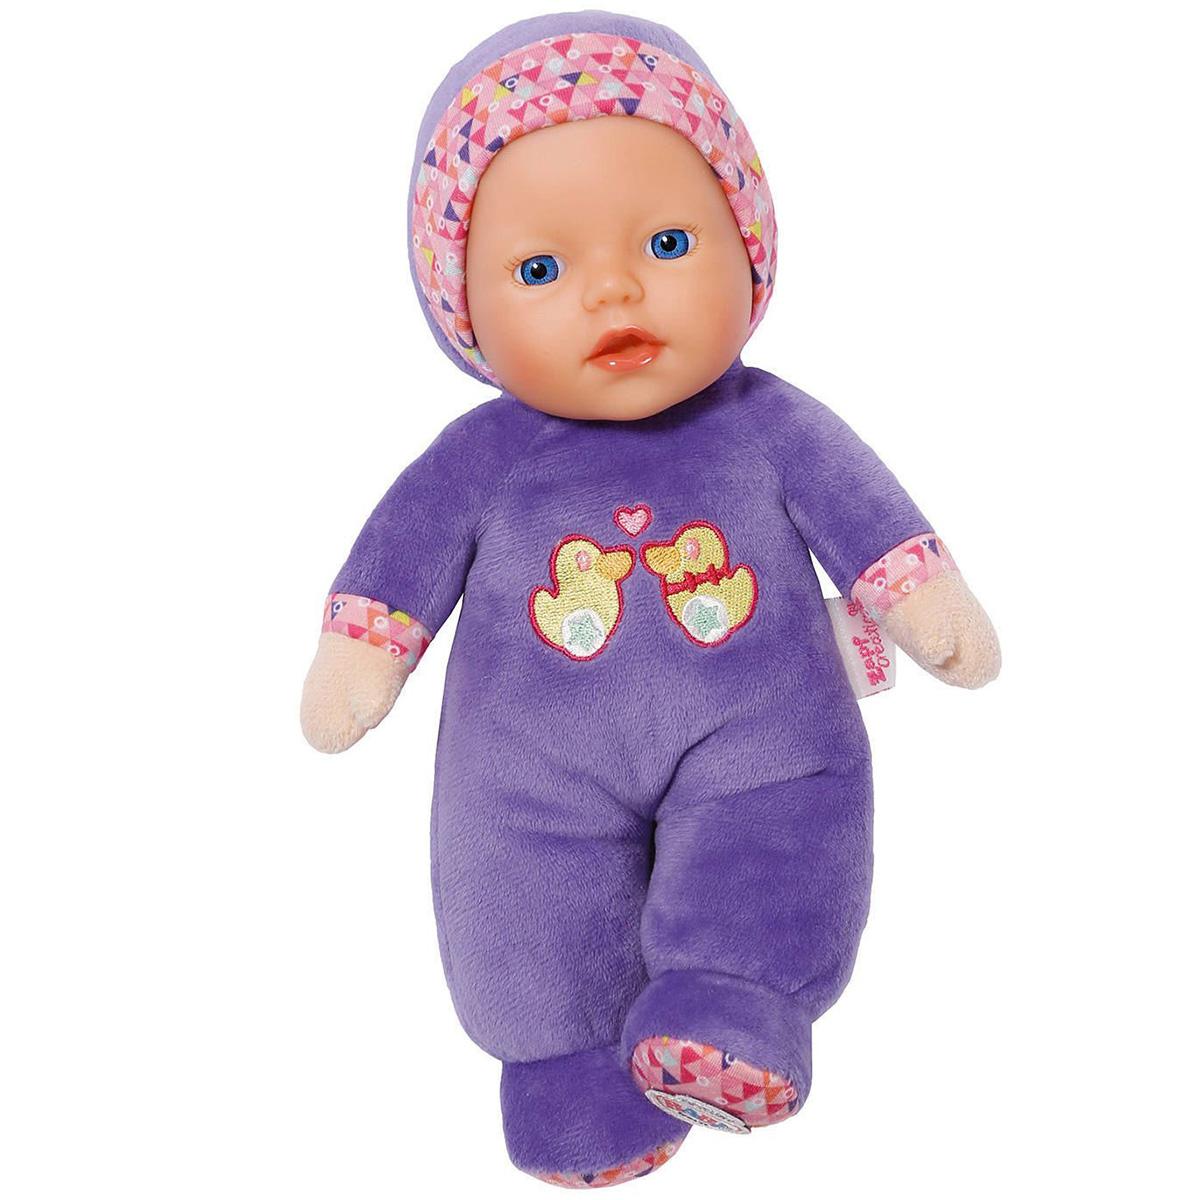 BABY born® First Love panenka 26 cm, 825303